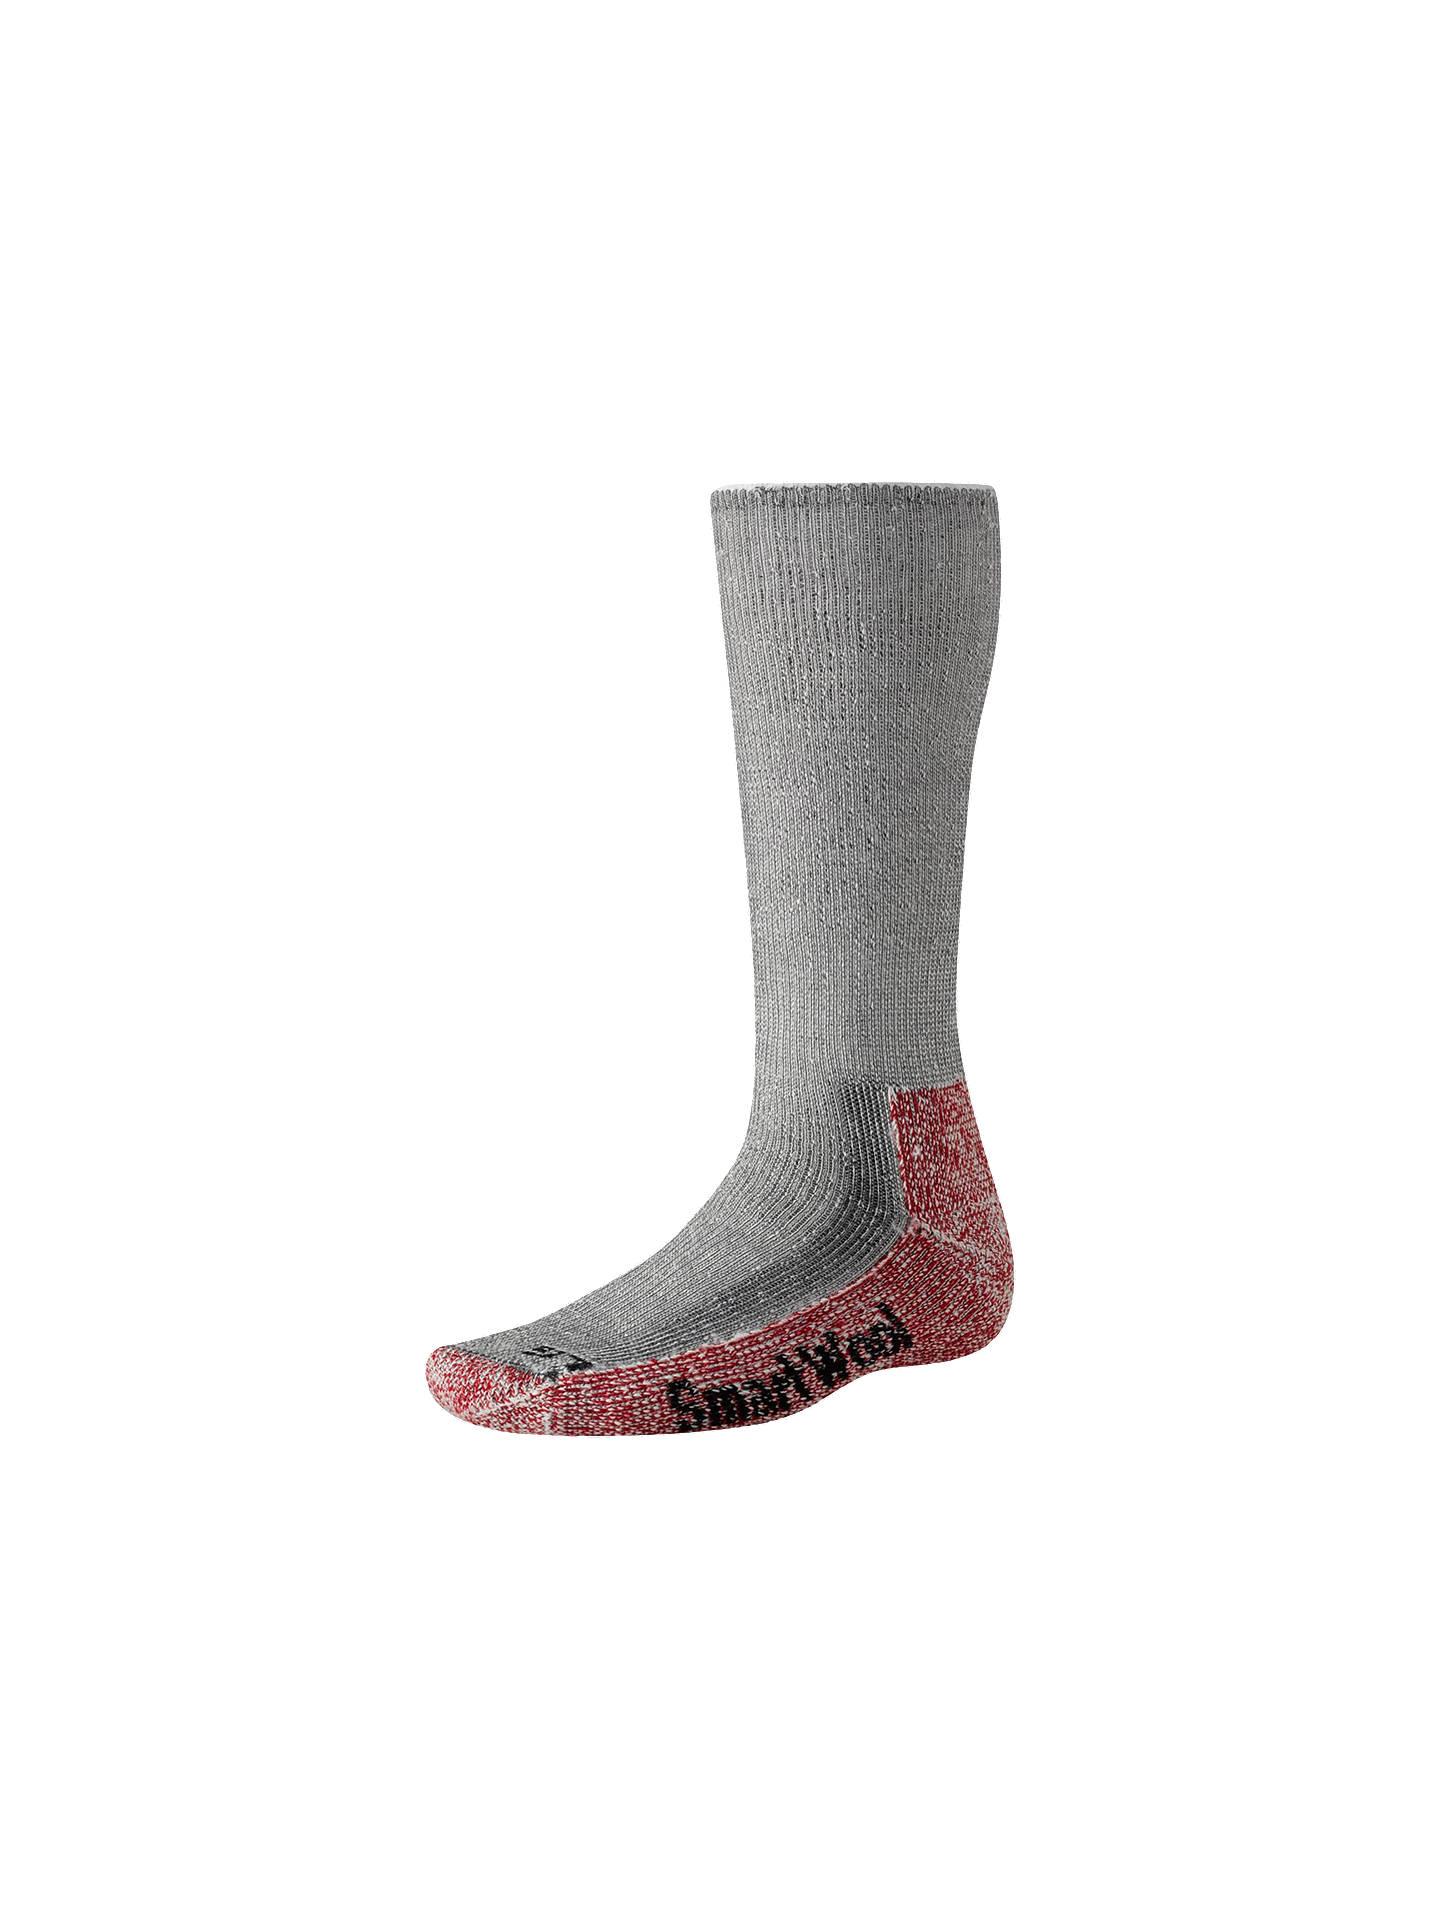 f9a3cda59 SmartWool Merino Wool Trekking Extra Heavy Crew Socks, Grey